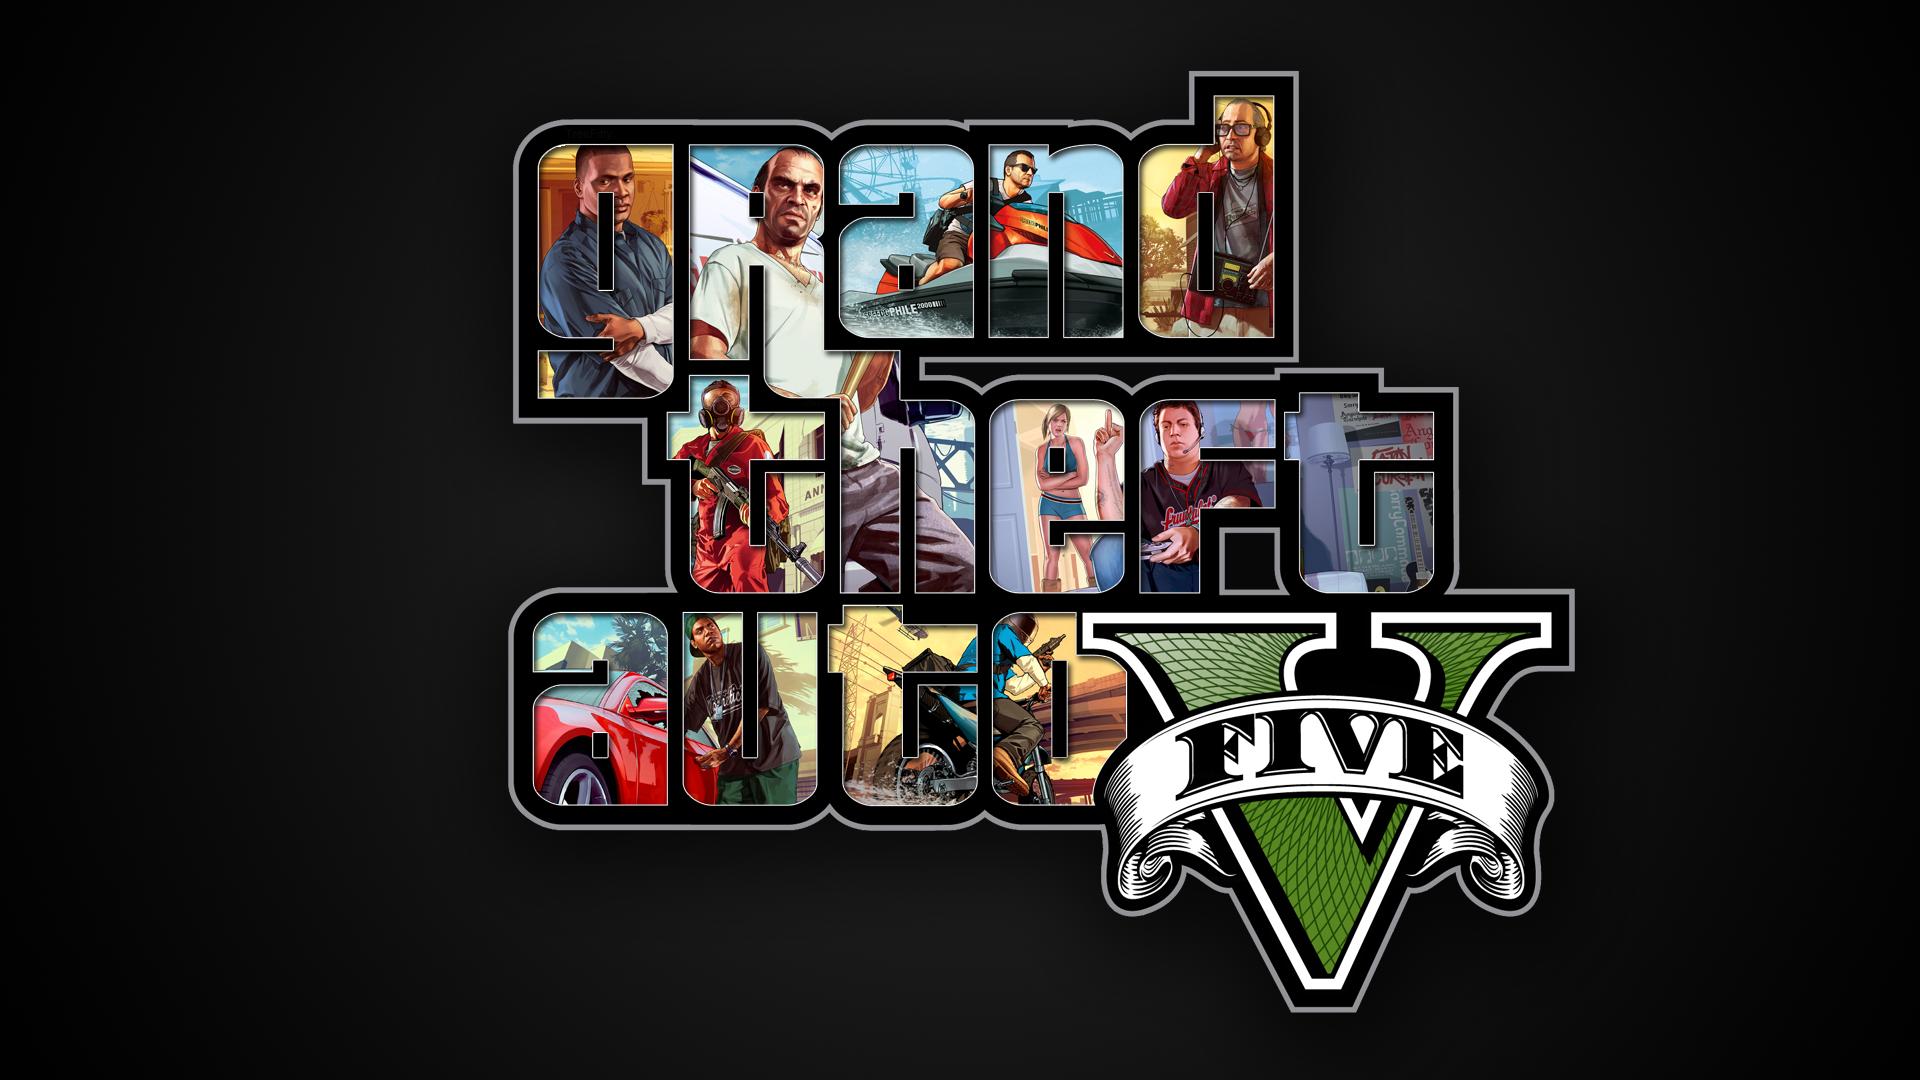 gta v wallpaper by xtiiger fan art wallpaper games 2013 2015 xtiiger 1920x1080